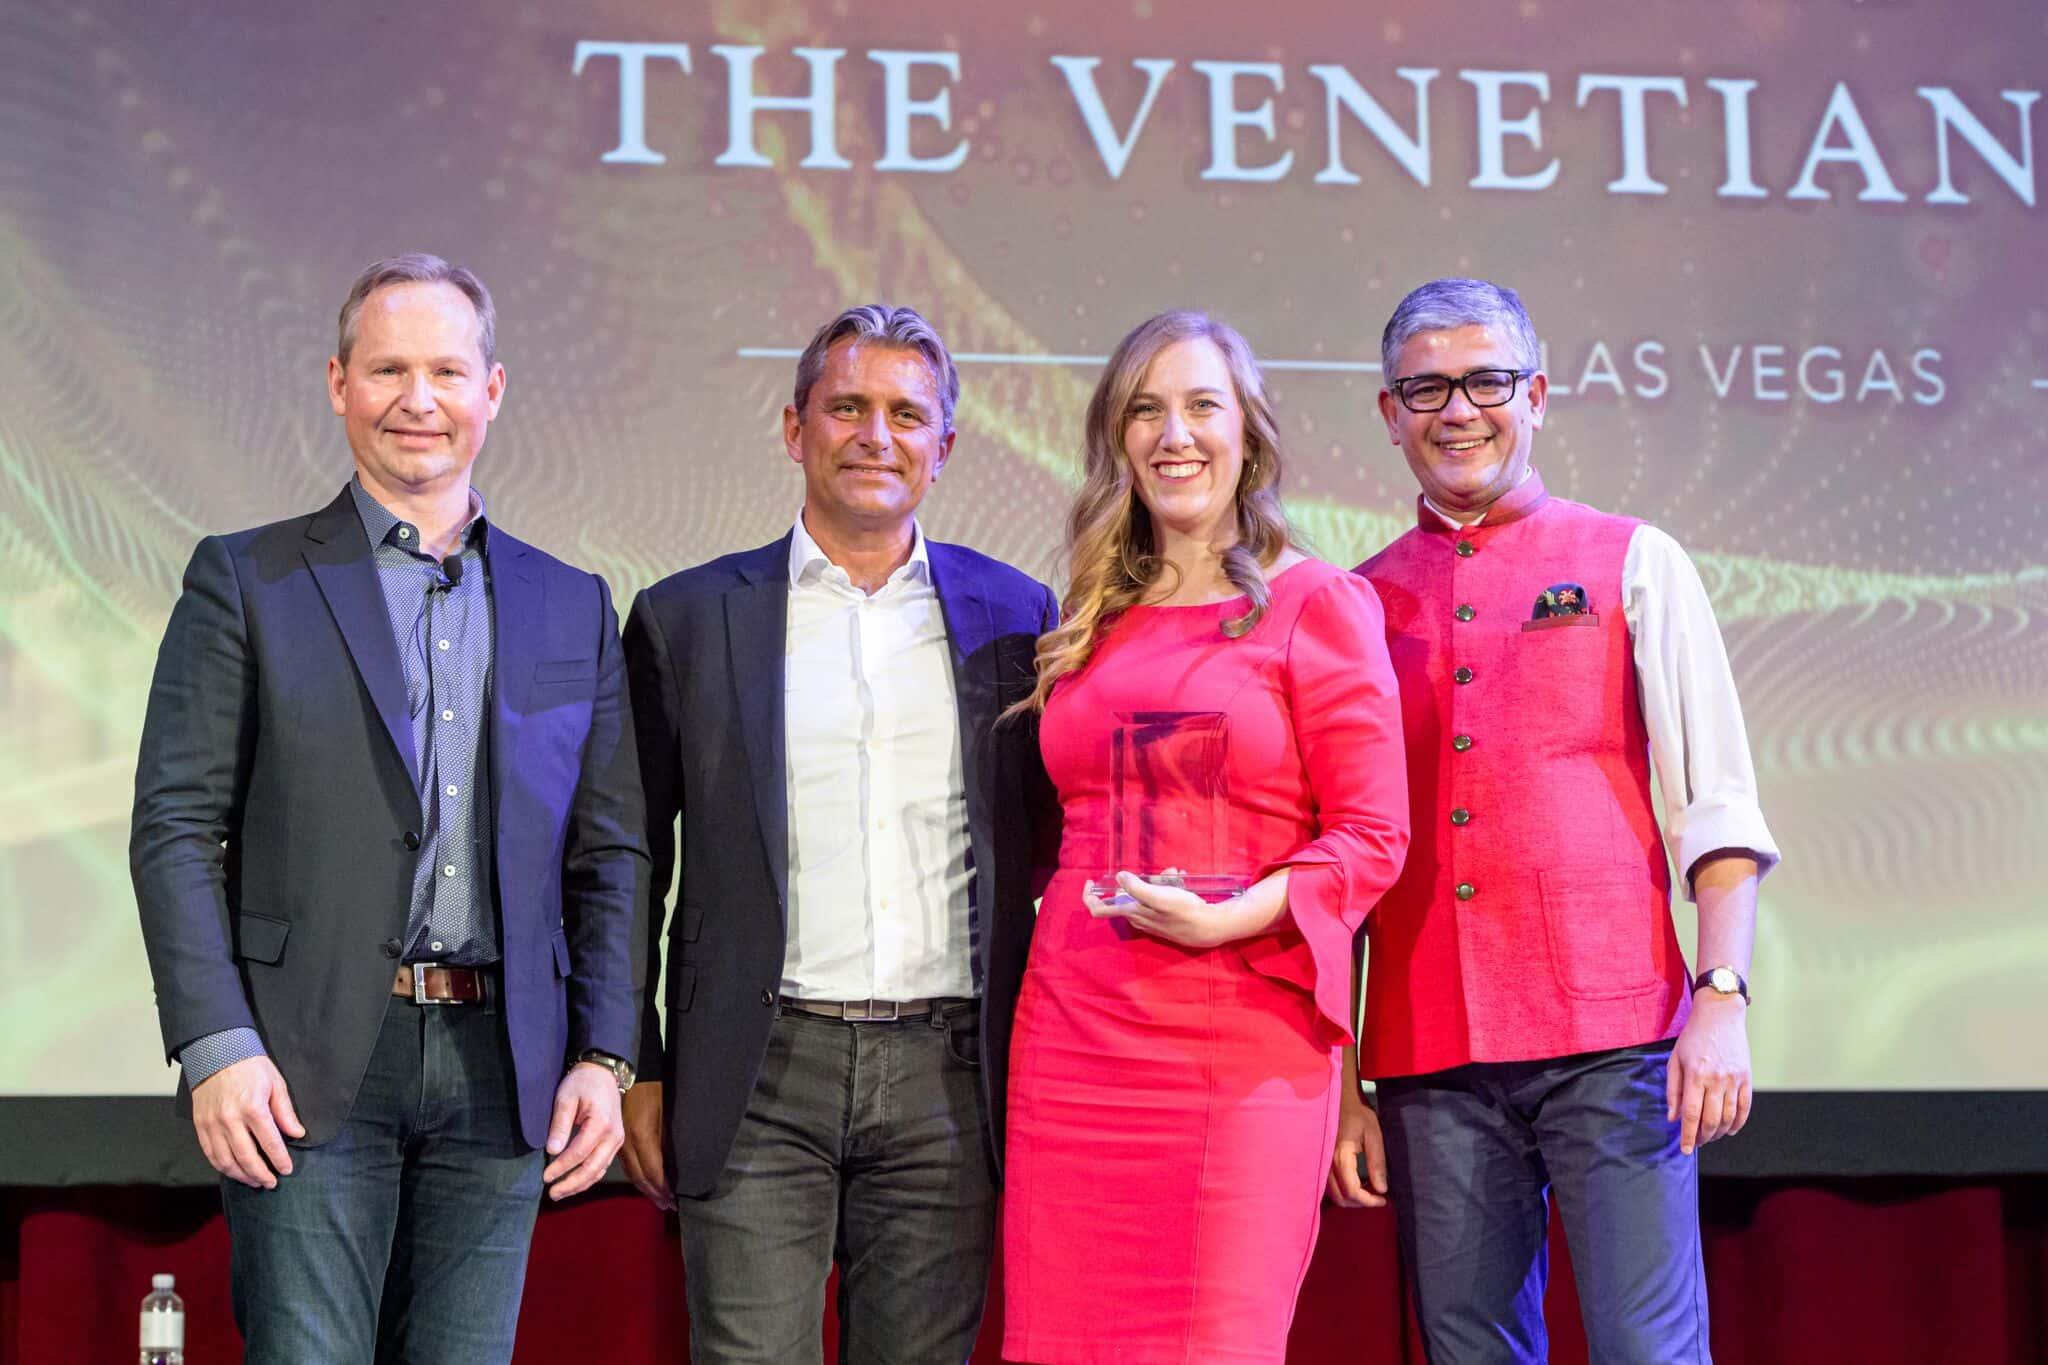 venetian_Partner_Awards_explore19_Expedia Group Media Solutions